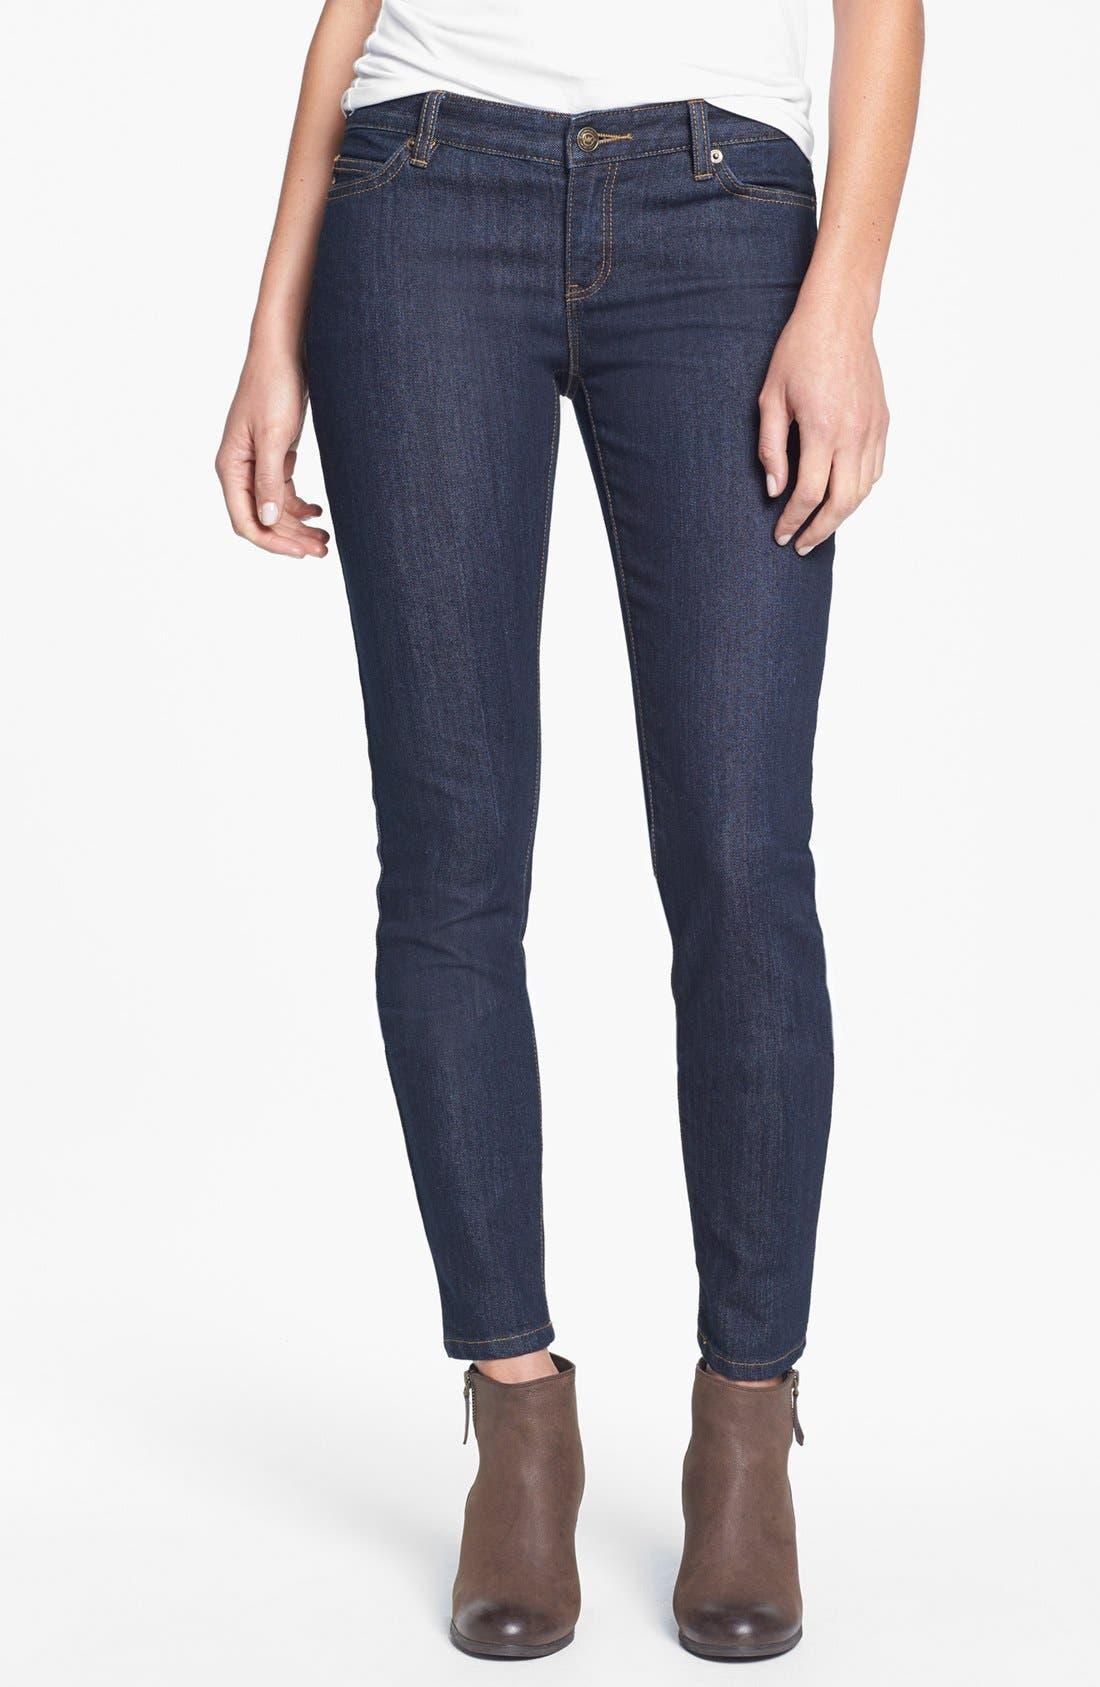 Main Image - MICHAEL Michael Kors 'Sausalito' Skinny Jeans (Petite)